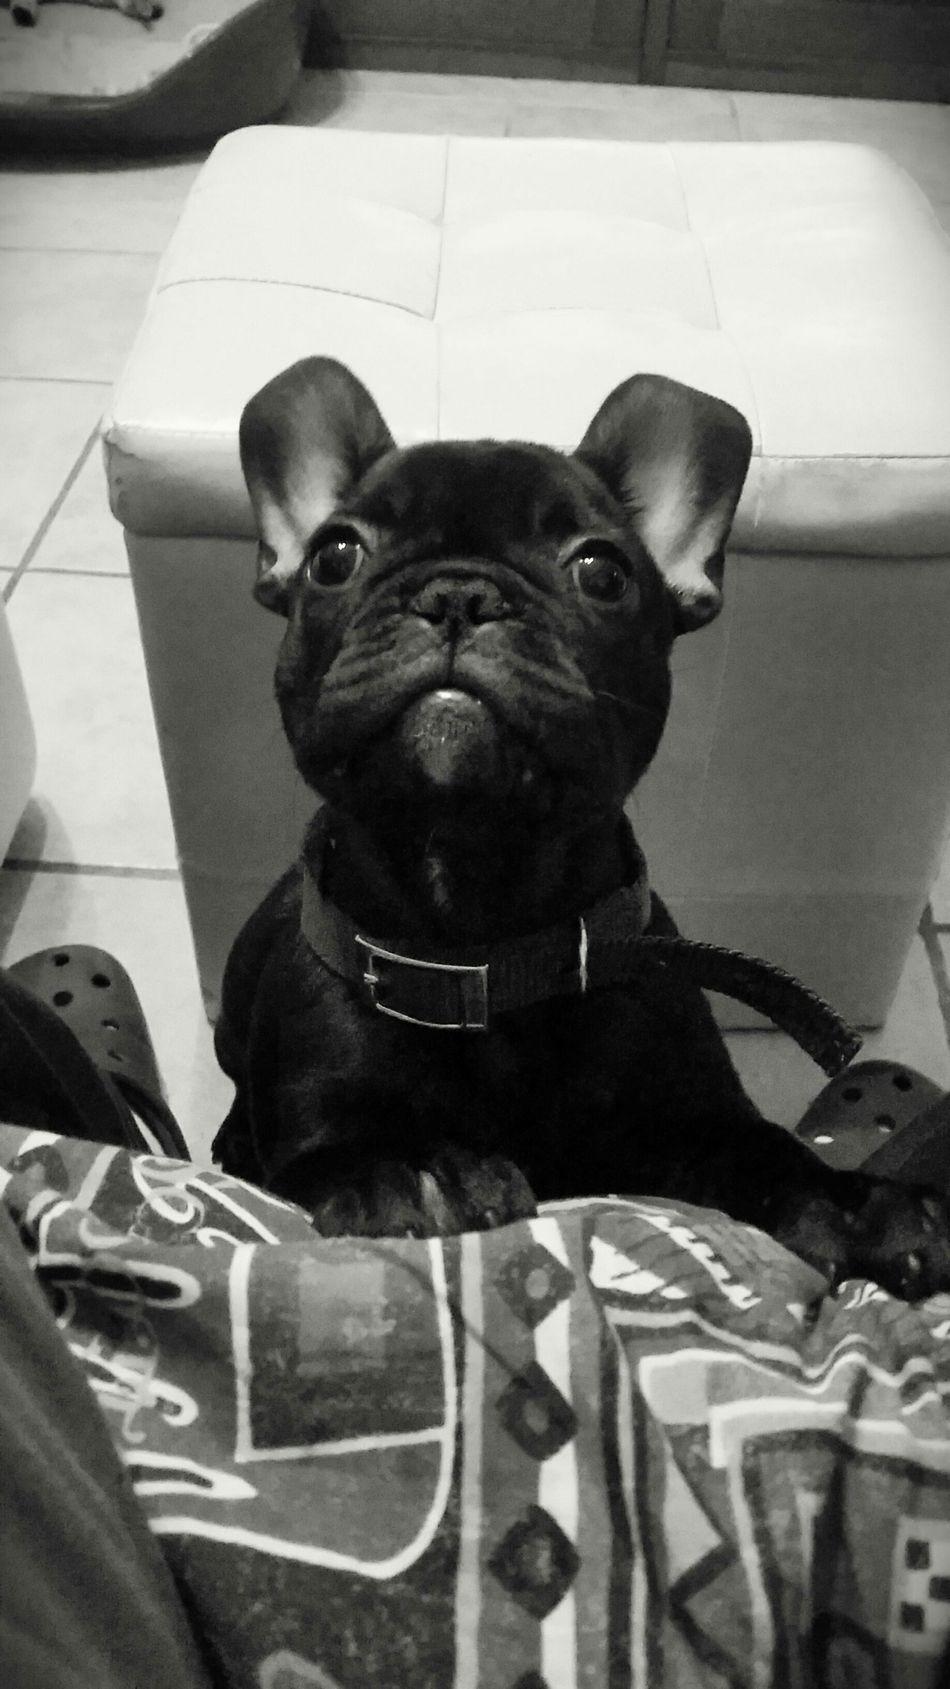 Dragon Bouledogue Francais Frenchbulldog Bulldogfrances Bouledoguefrancais French Bulldog My Dog I Love My Dog Dog ❤ Bulldog Francese Bouledogue Francese Piemonte